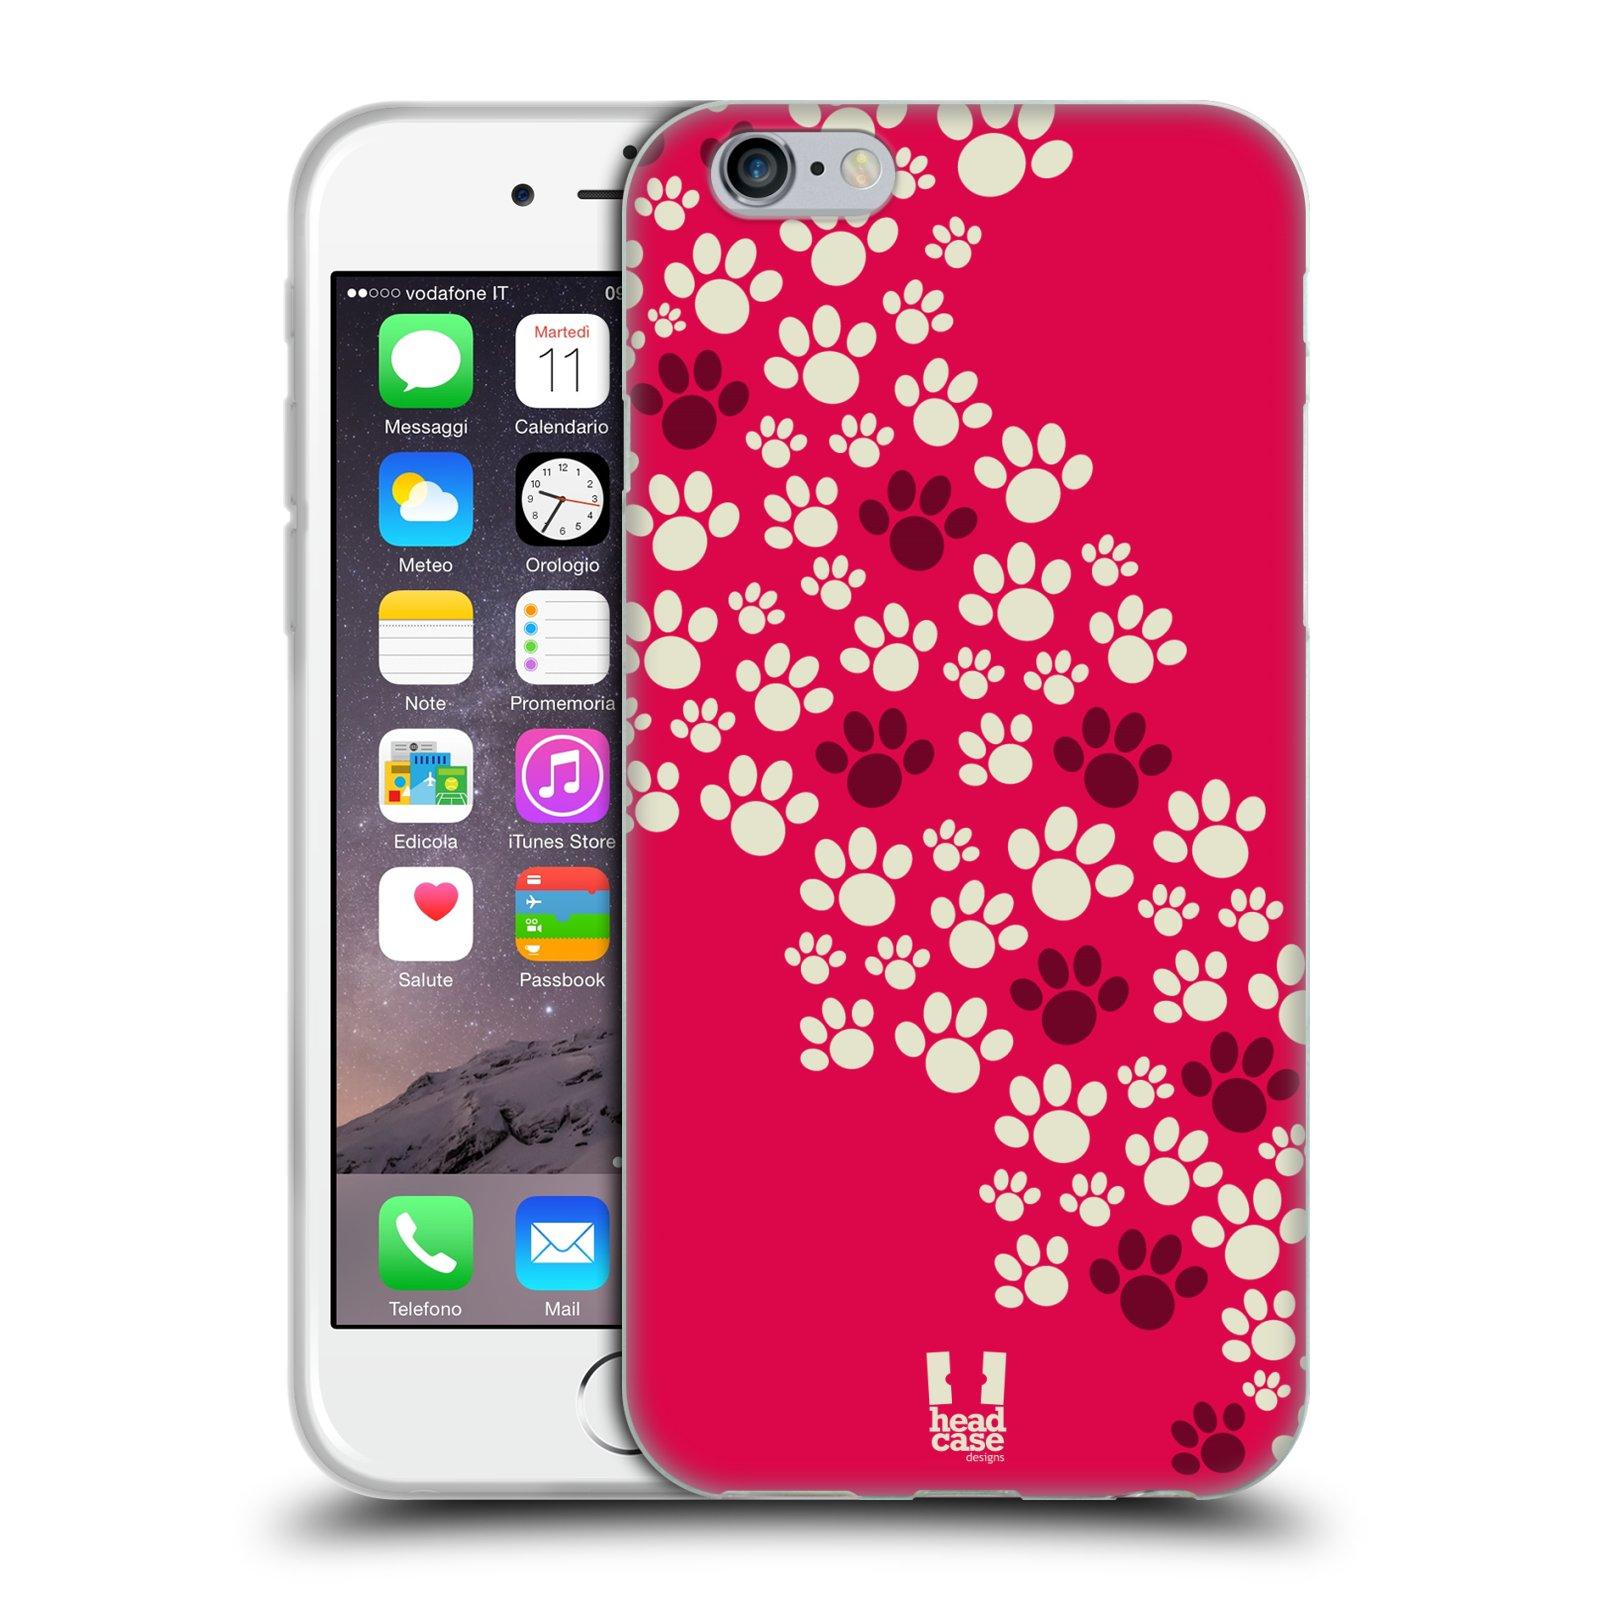 Silikonové pouzdro na mobil Apple iPhone 6 a 6S HEAD CASE TLAPKY RŮŽOVÉ (Silikonový  kryt c35285d4218